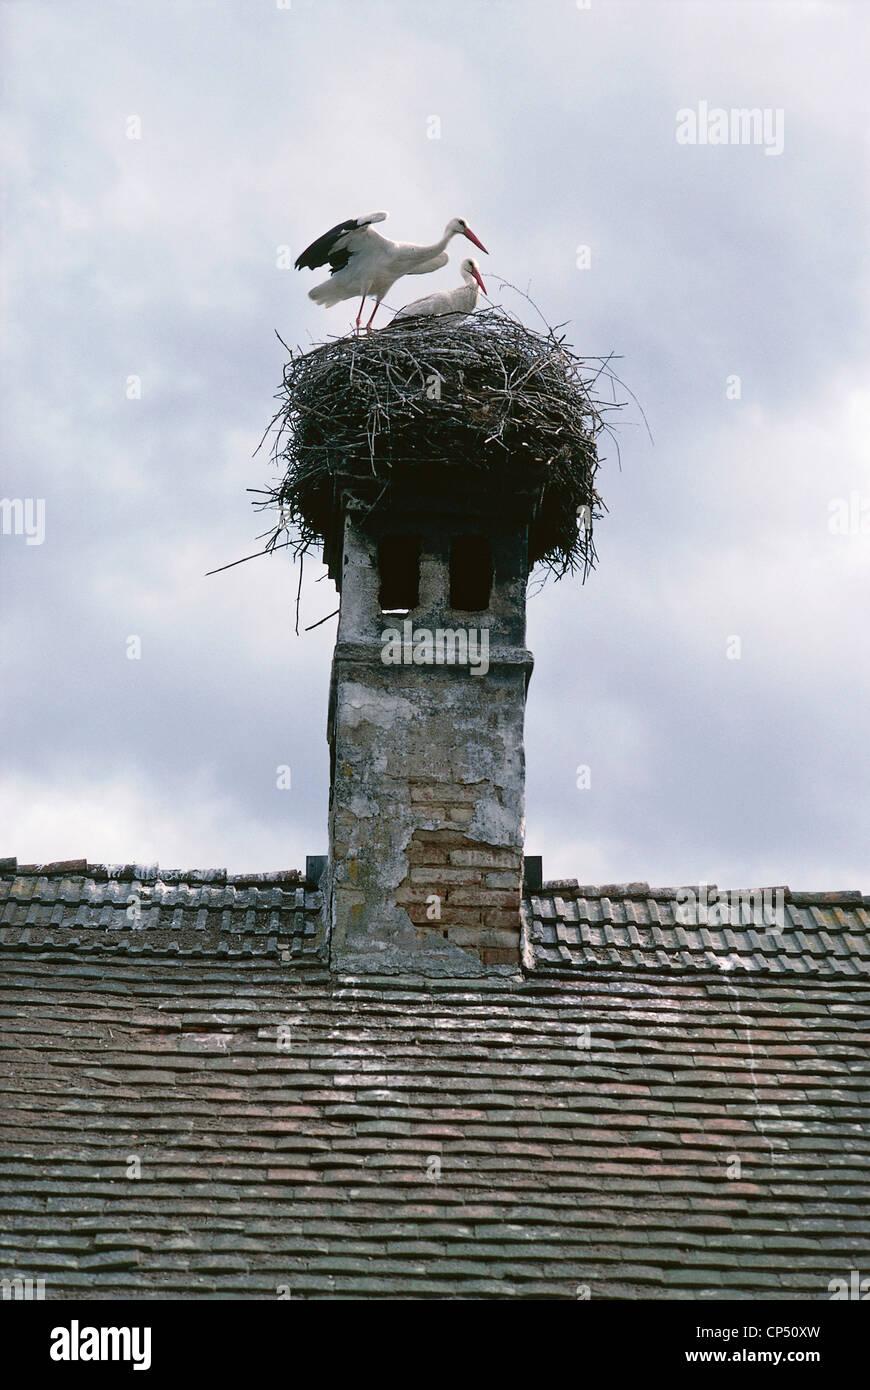 Zoology - Birds - Ciconiformi - Nest of White Stork (Ciconia ciconia) on a chimney. Austria, Burgenland. - Stock Image